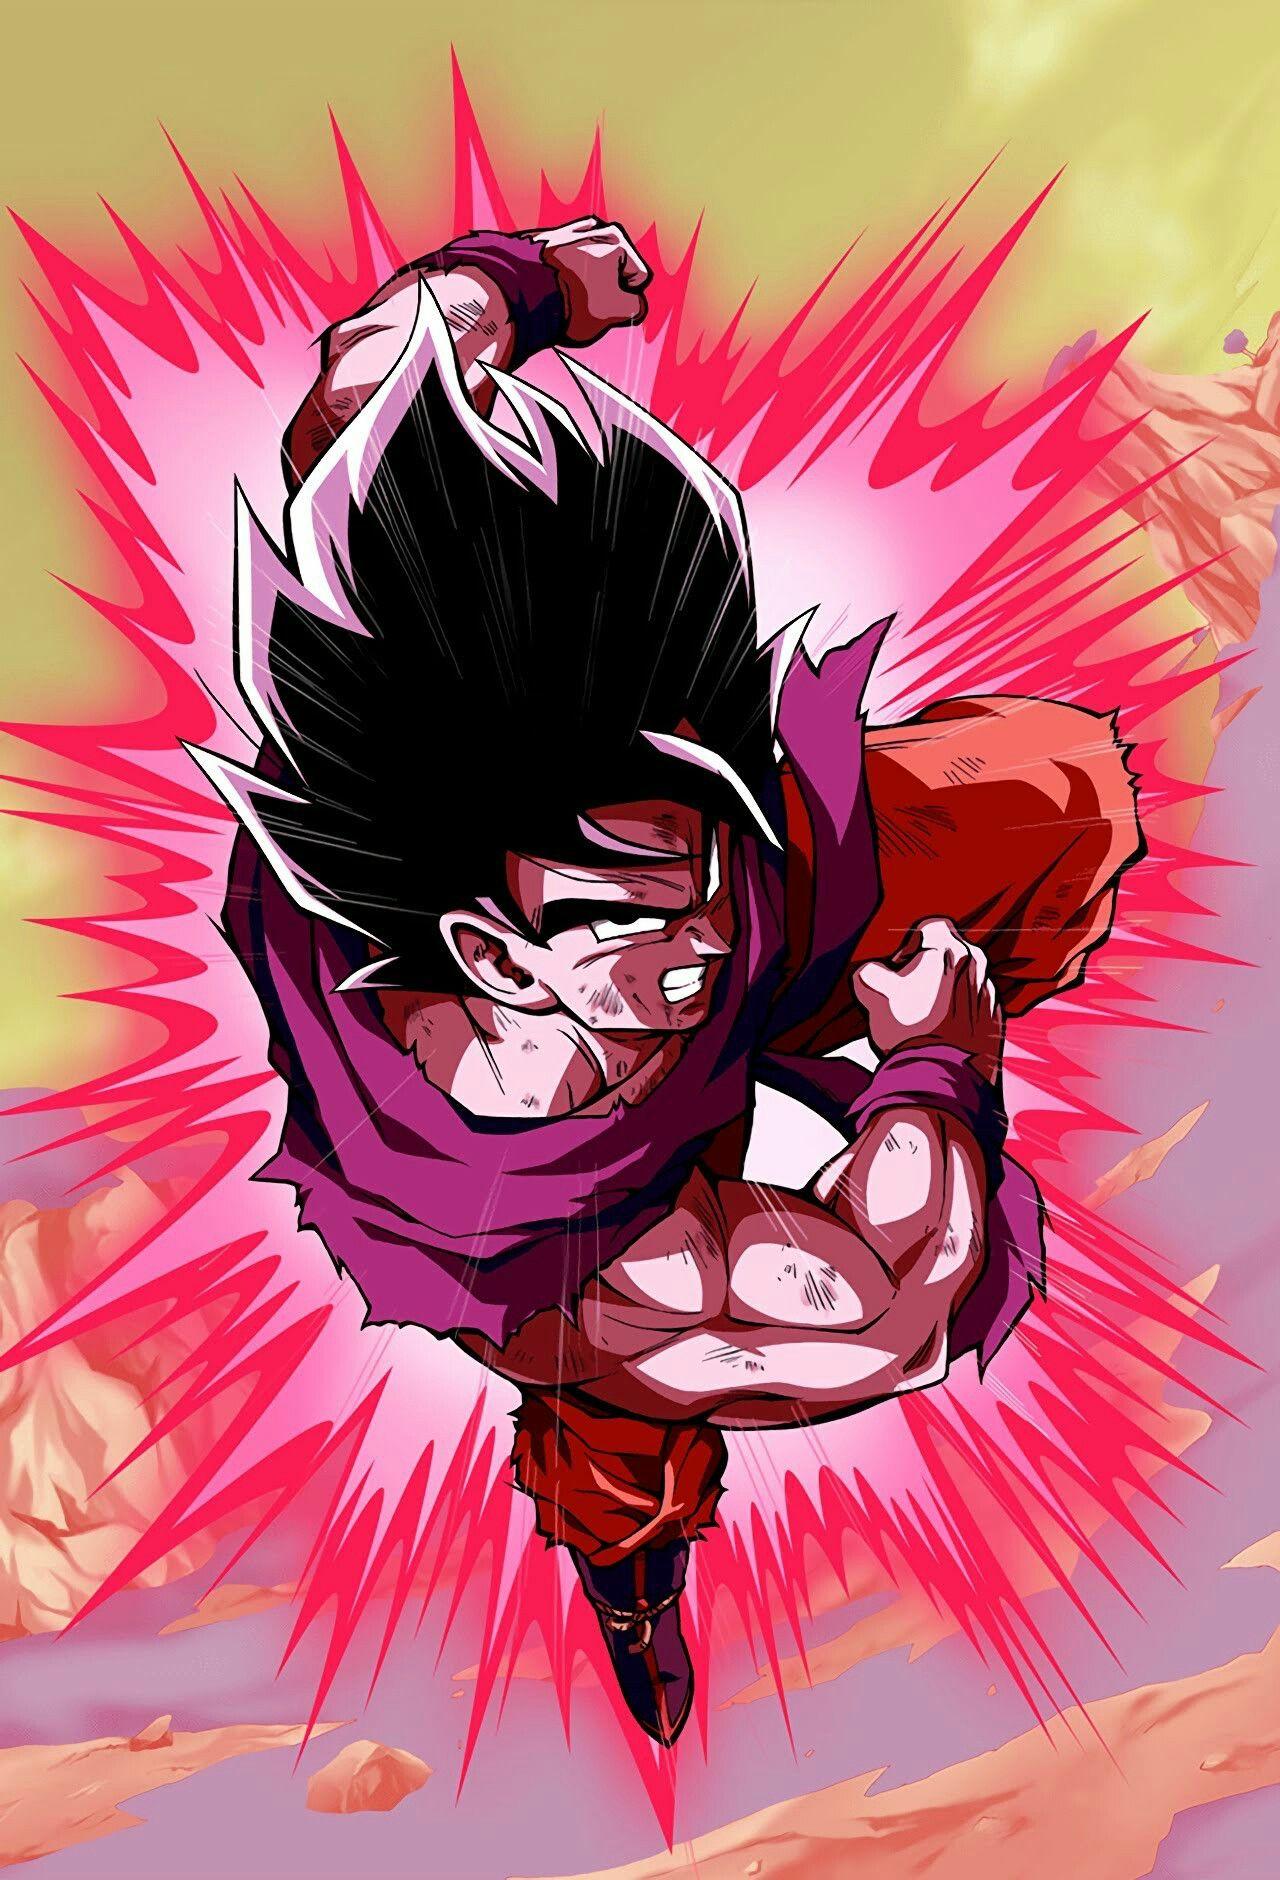 Goku Kaioken   1280x1880 Wallpaper   teahubio 1280x1880